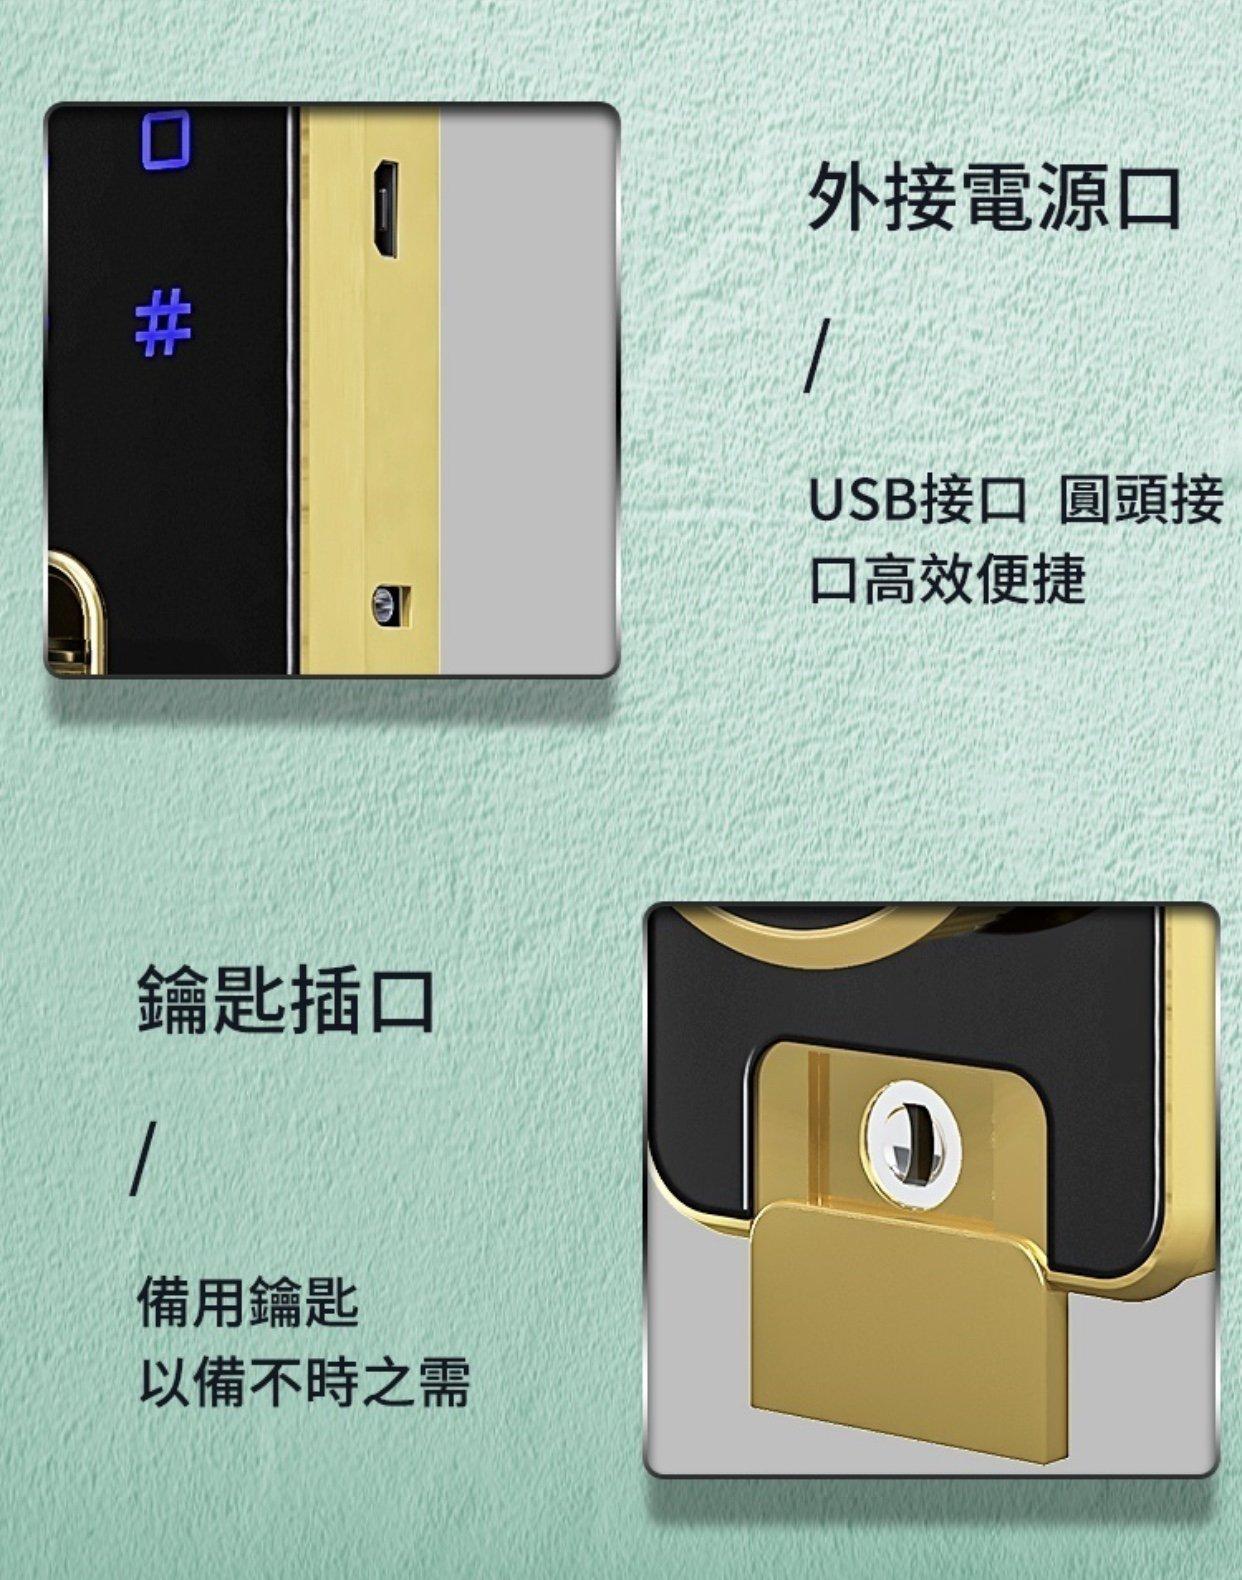 Marketing graphic-MB45-5